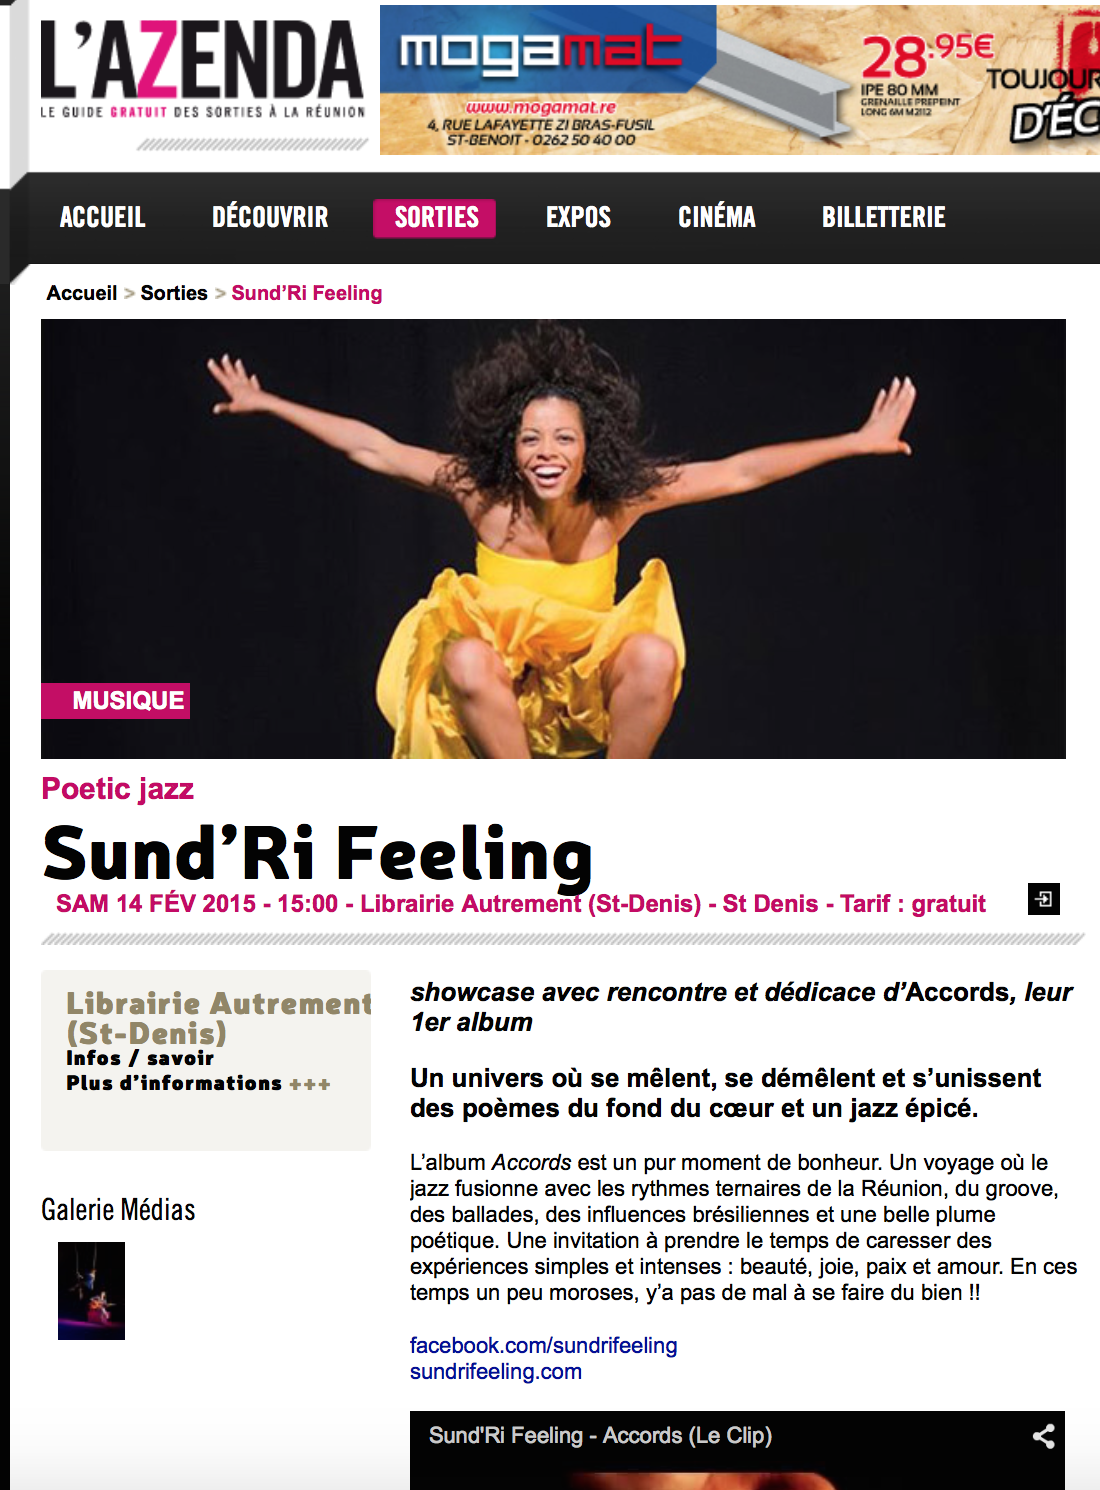 SundRi Feeling_Azenda_14Fev2015.png